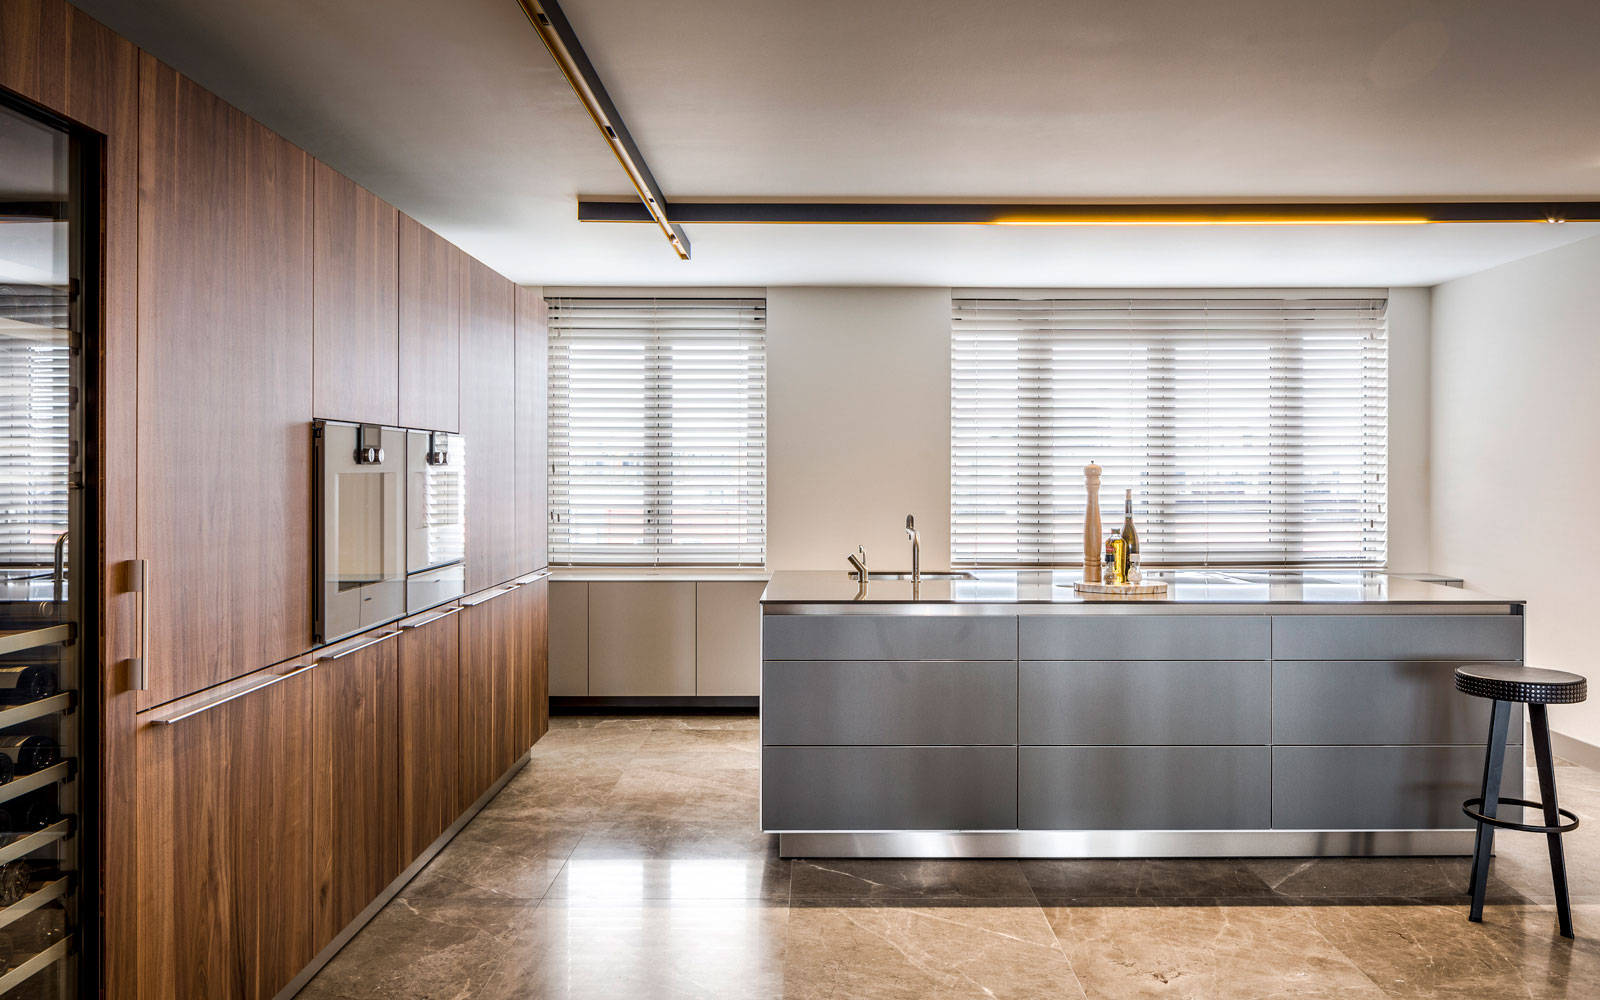 Design keuken, bulthaup, exclusief, keukenblad, keukeneiland, hart van de woning